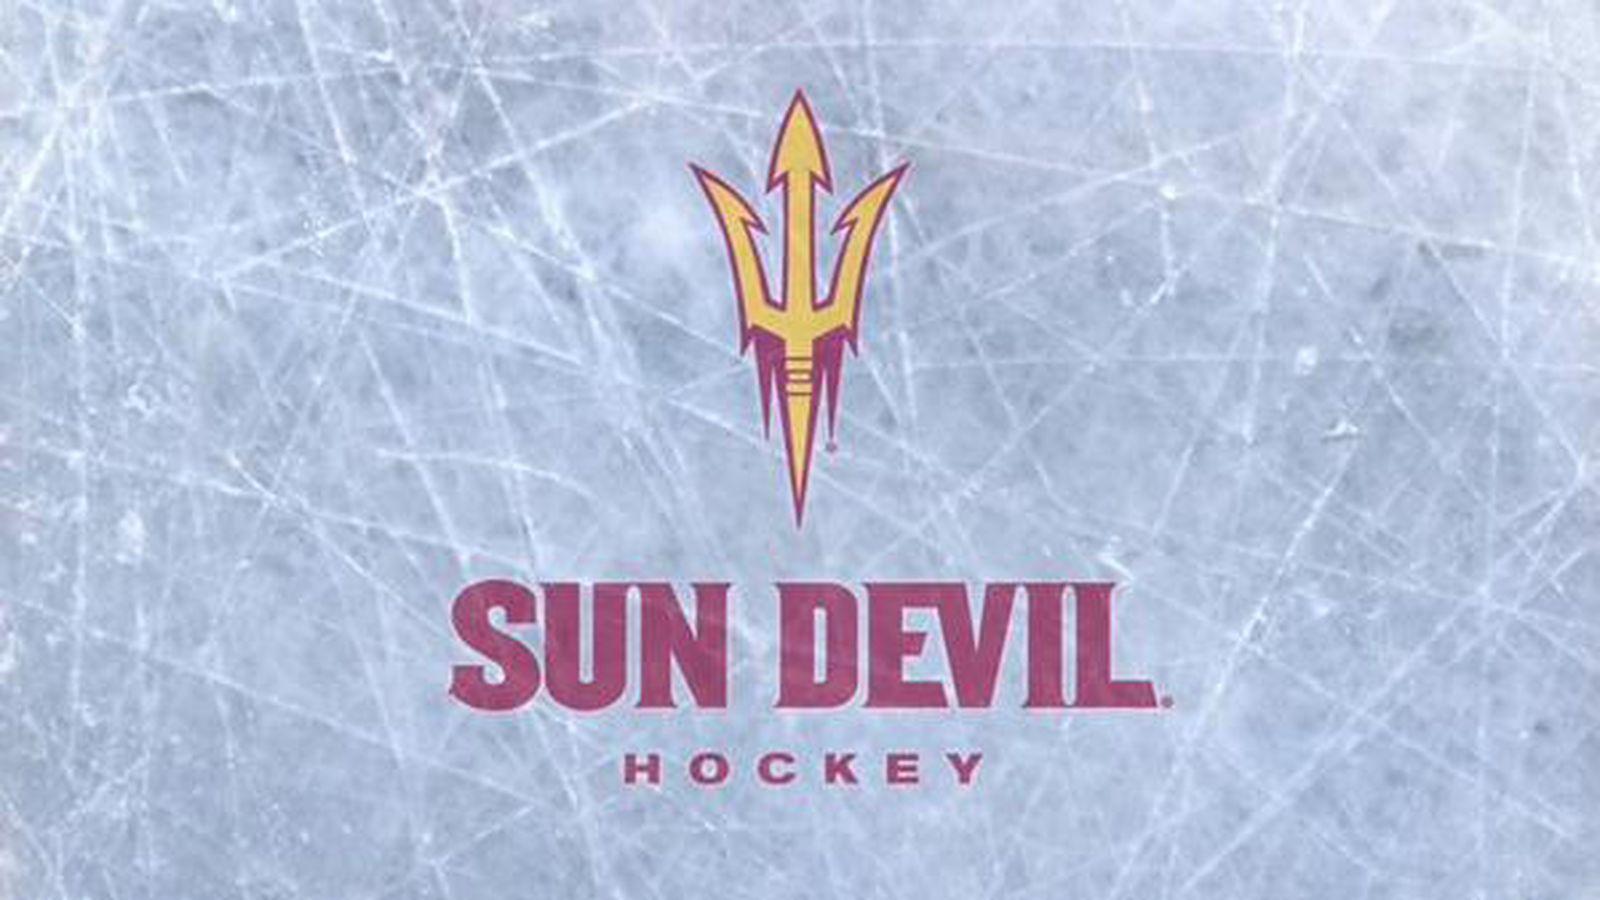 Sun_devil_hockey_.0.0